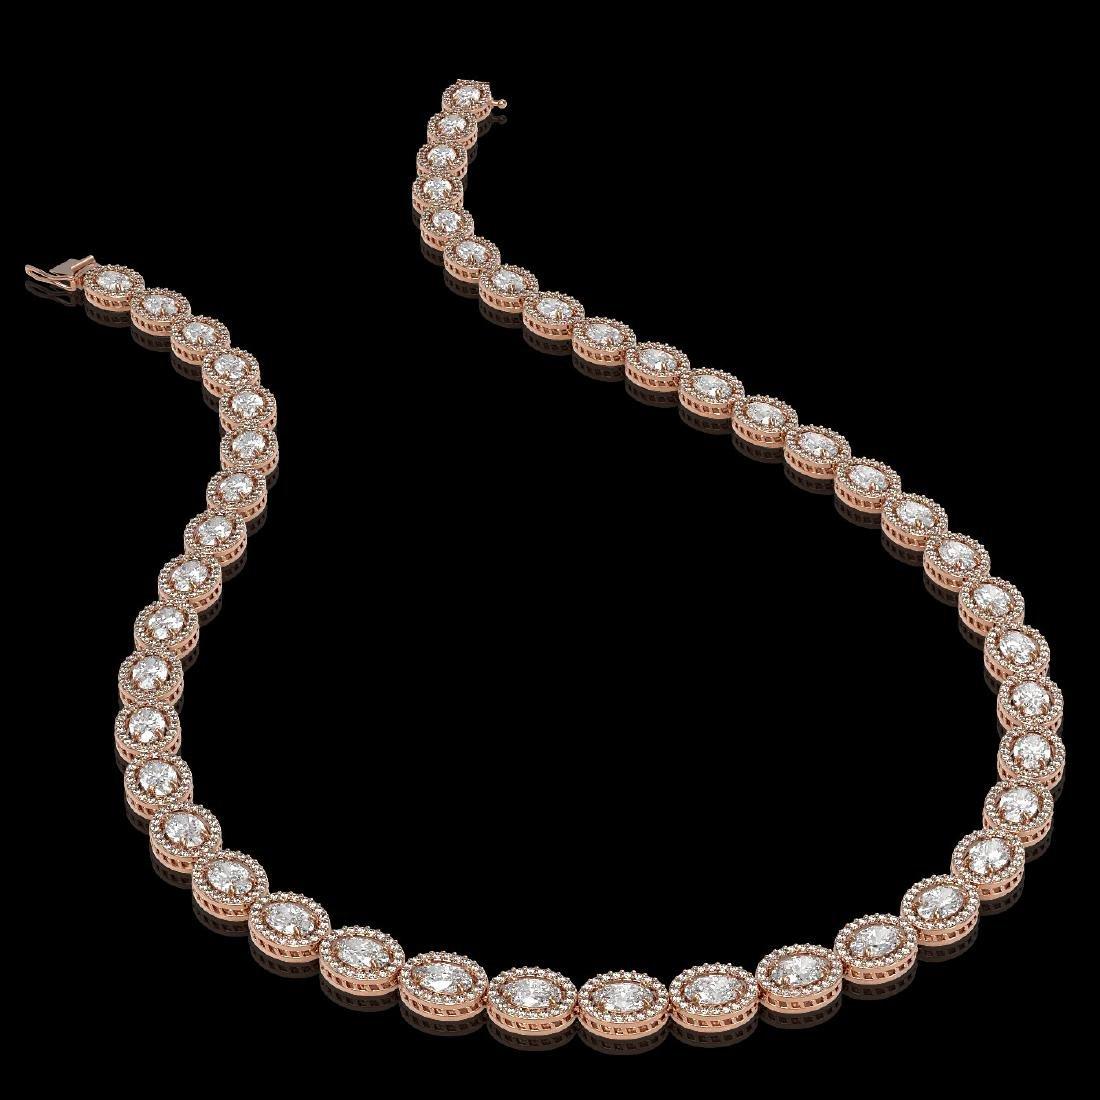 30.41 CTW Oval Diamond Designer Necklace 18K Rose Gold - 2